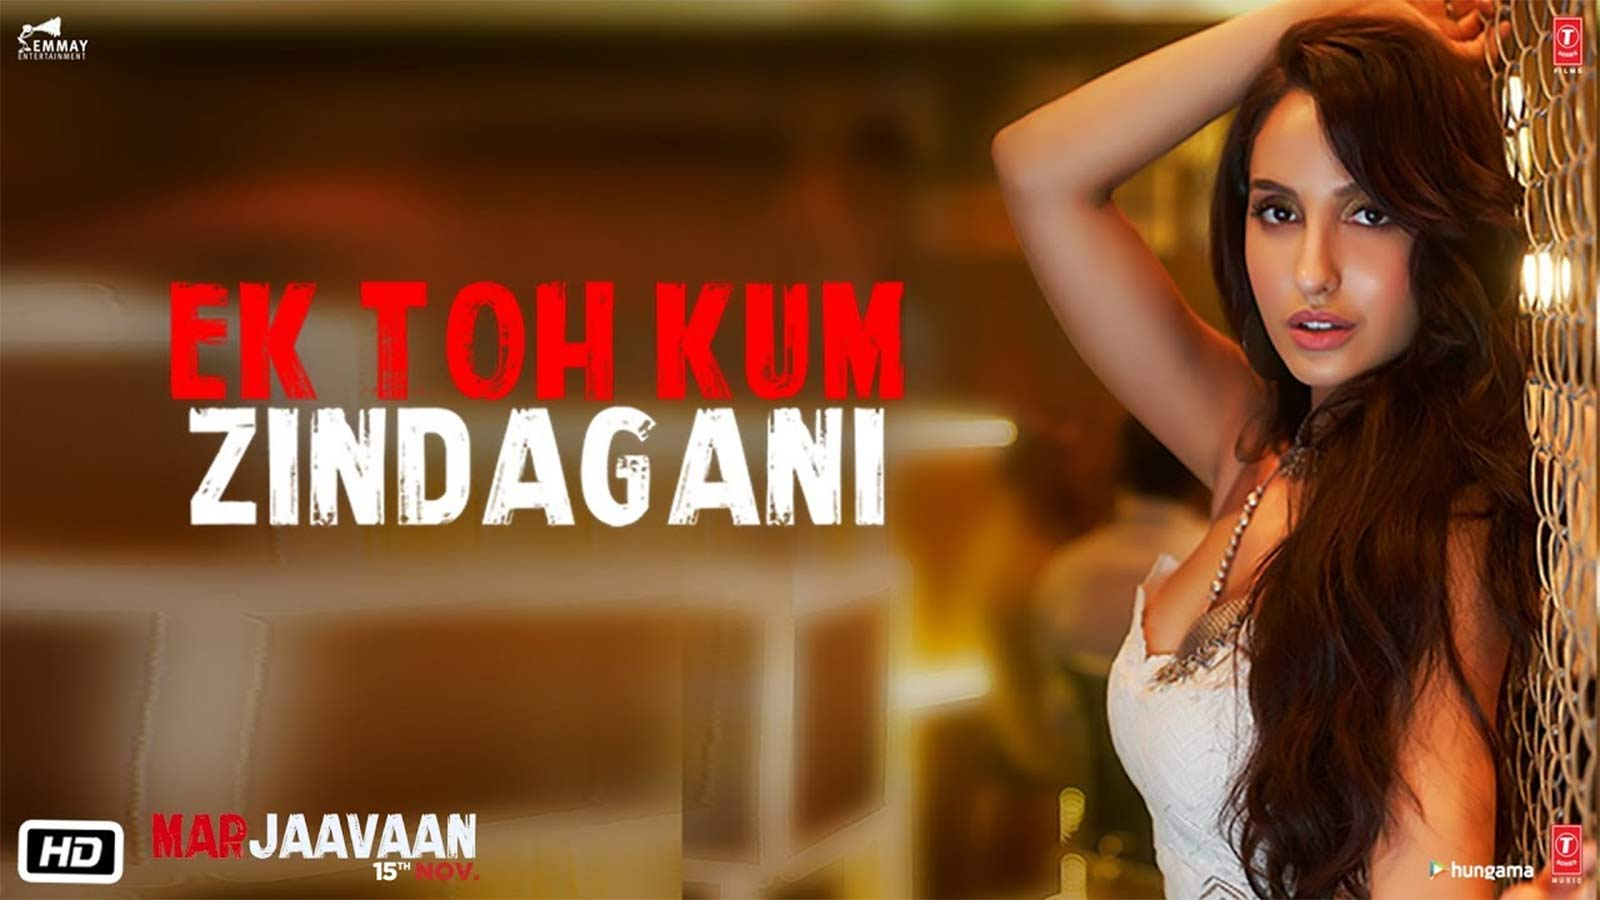 Marjaavaan Song Ek Toh Kum Zindagani Hindi Video Songs Times Of India